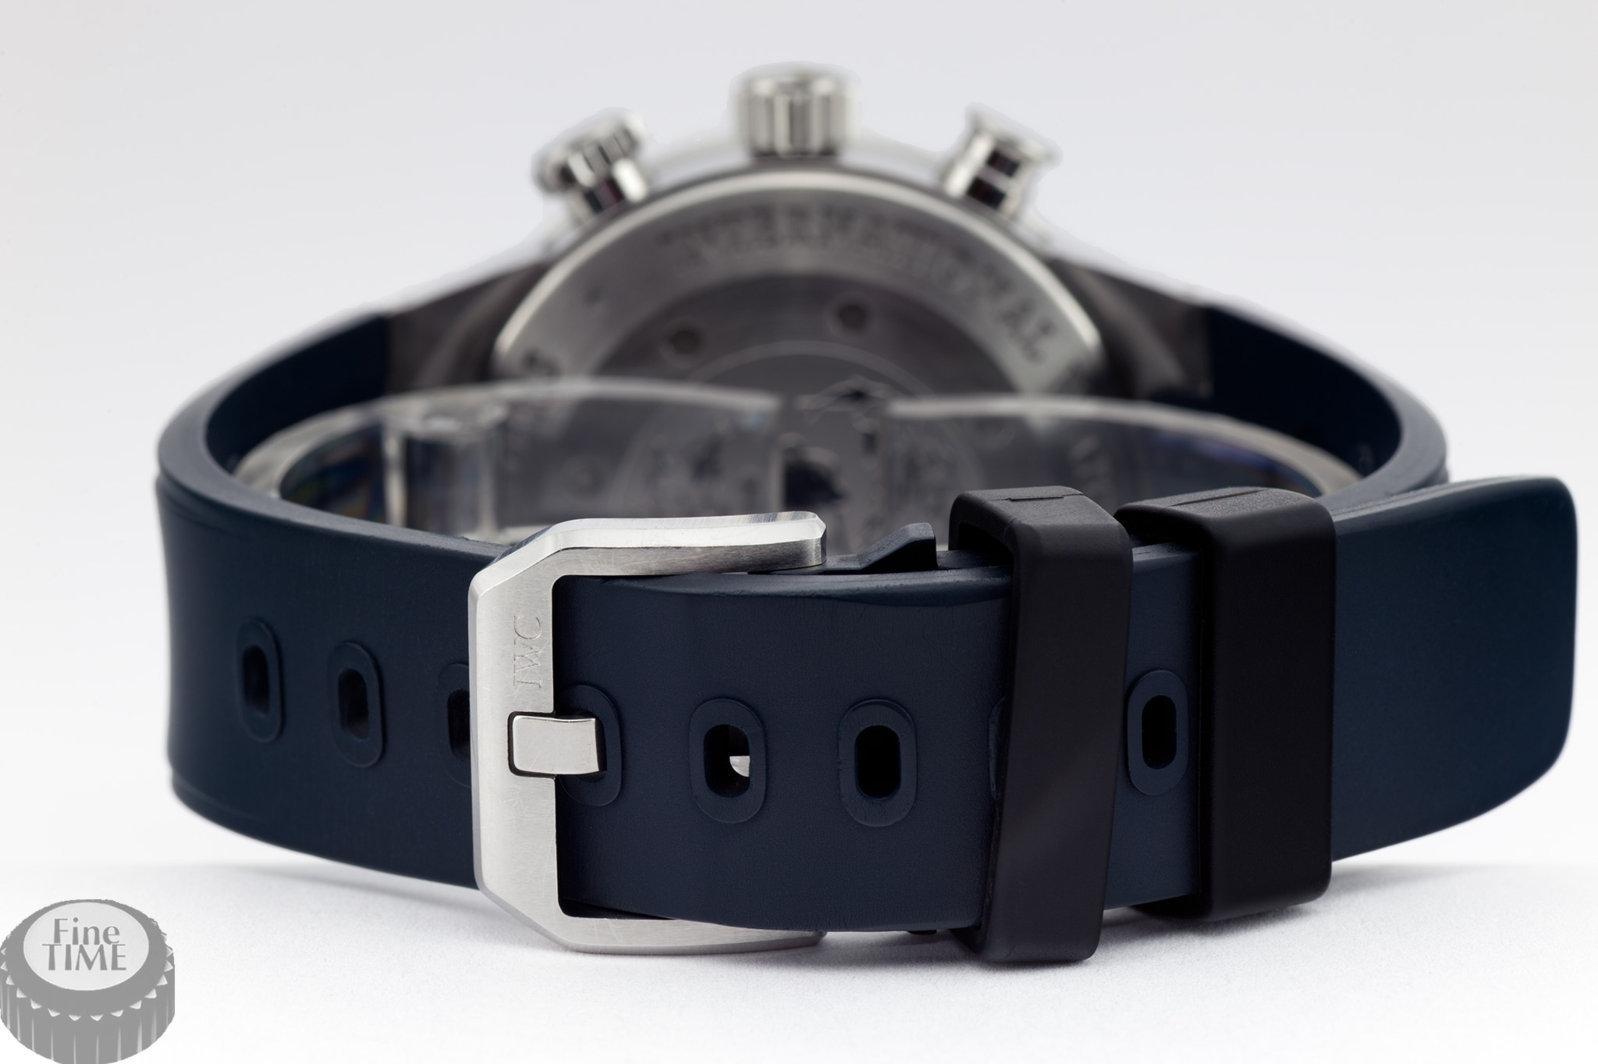 iwc-aquatimer-chronograph-cousteau-divers-iw378101-03.jpg